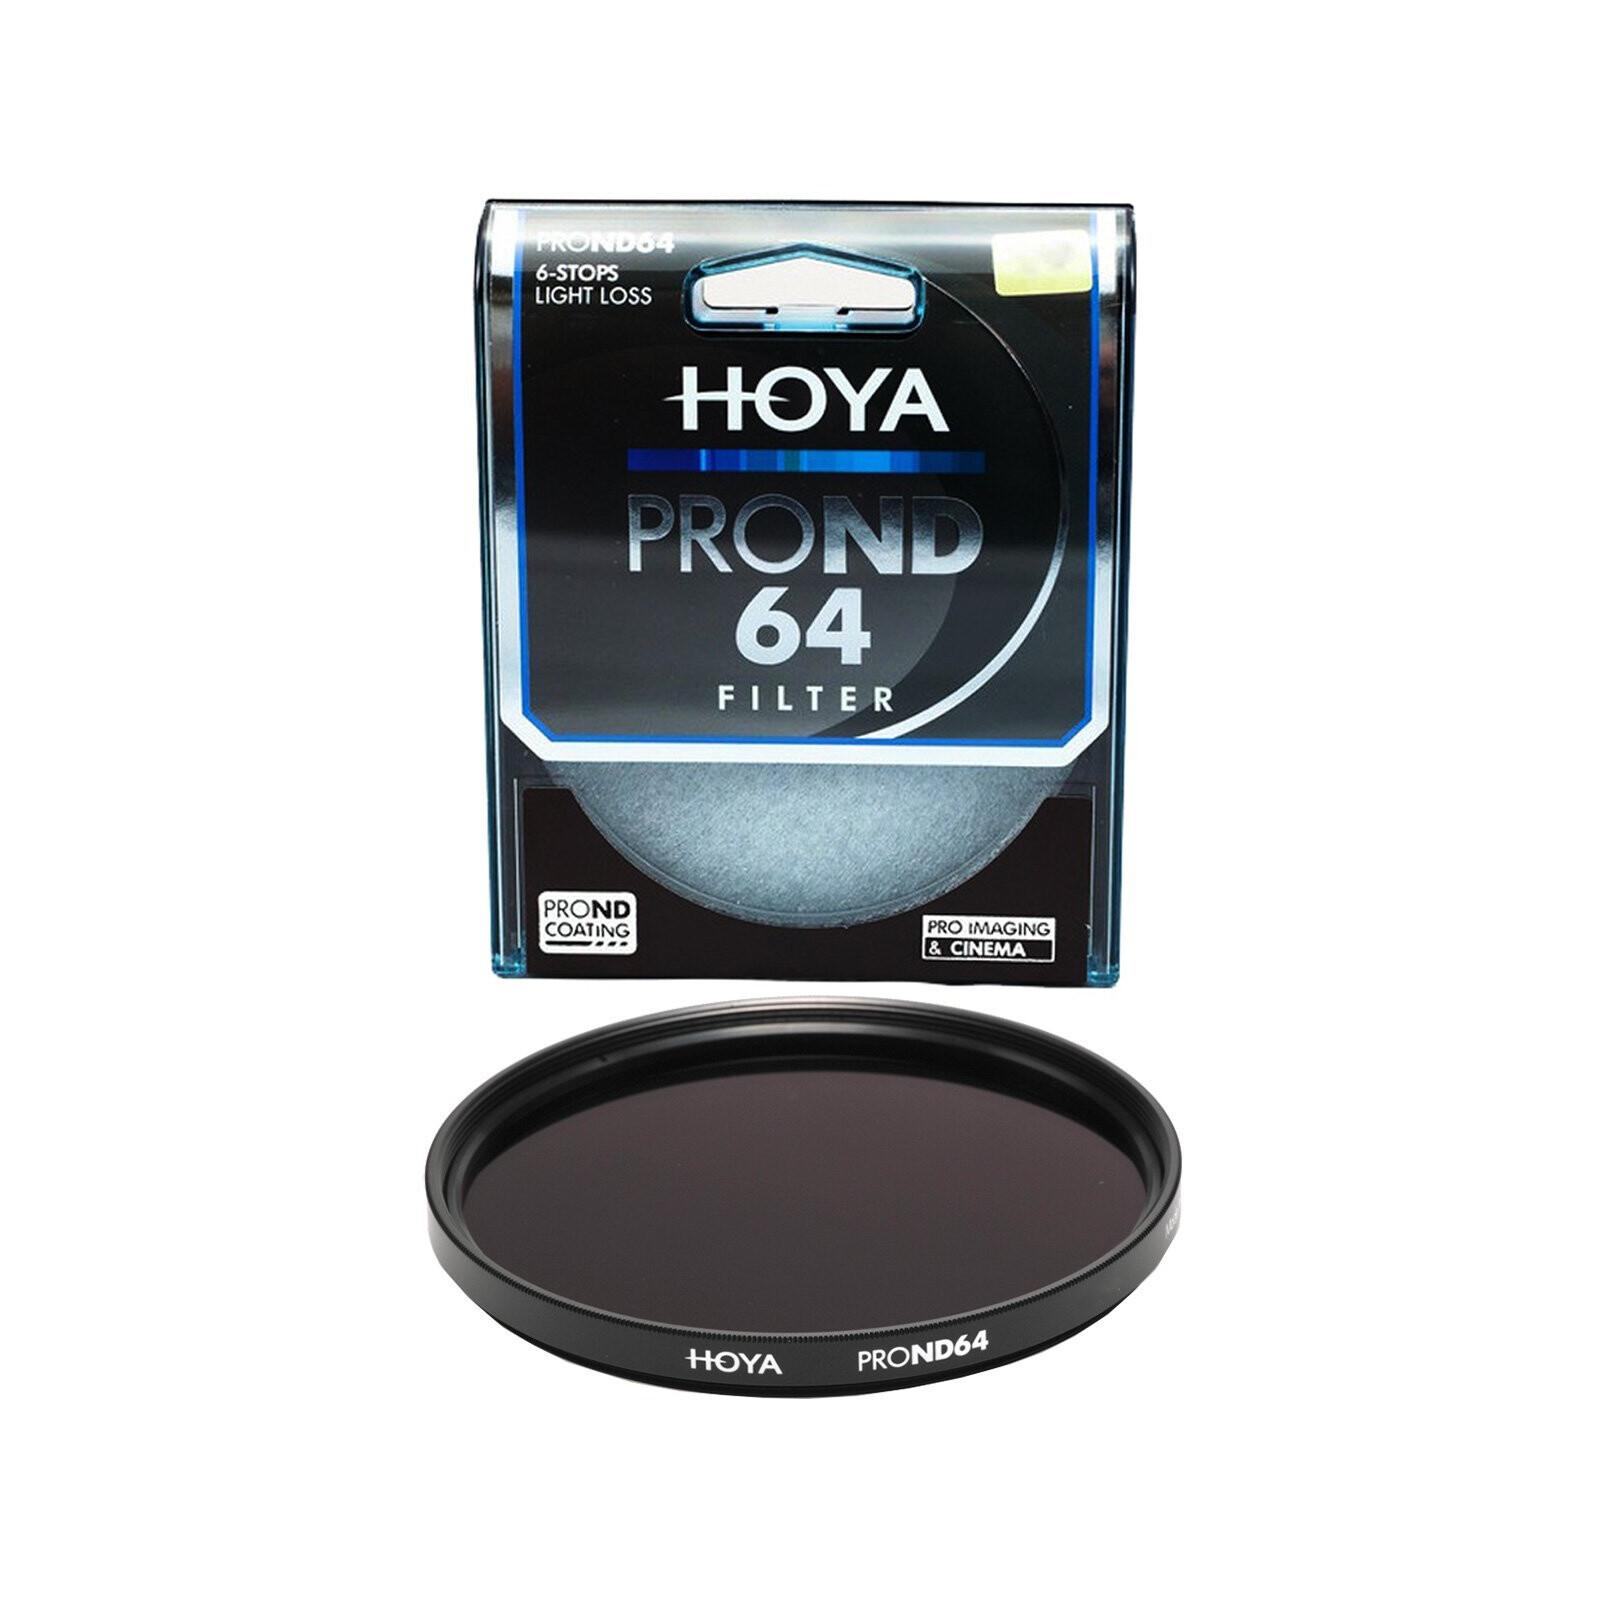 Hoya Grau PRO ND 4 77mm